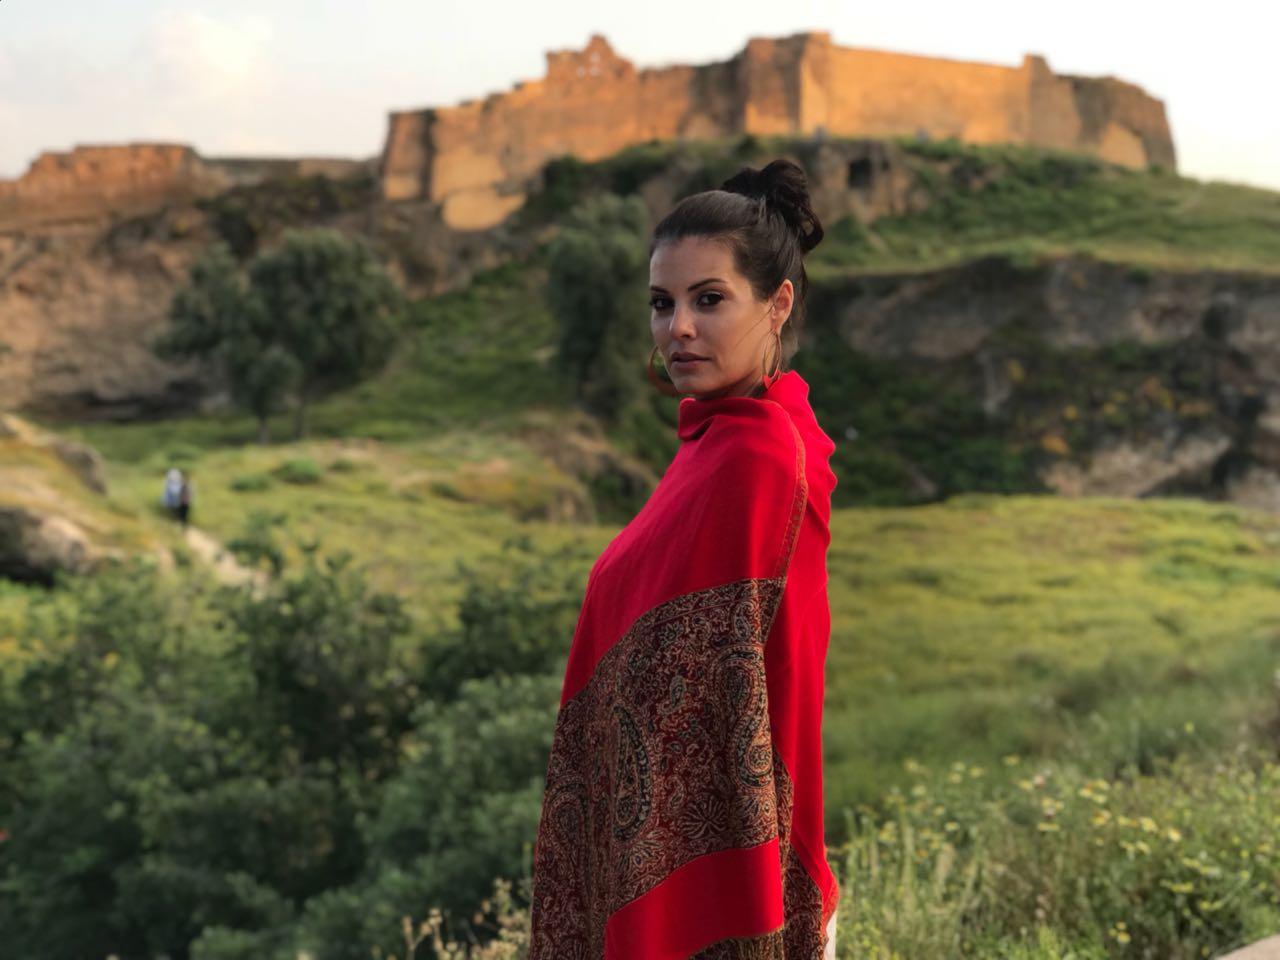 Celebrity Travel: Ταξιδεύει στο Μαρόκο με τον Γιάννη Αϊβάζη και την Μαρία Κορινθίου! [pics] | tlife.gr